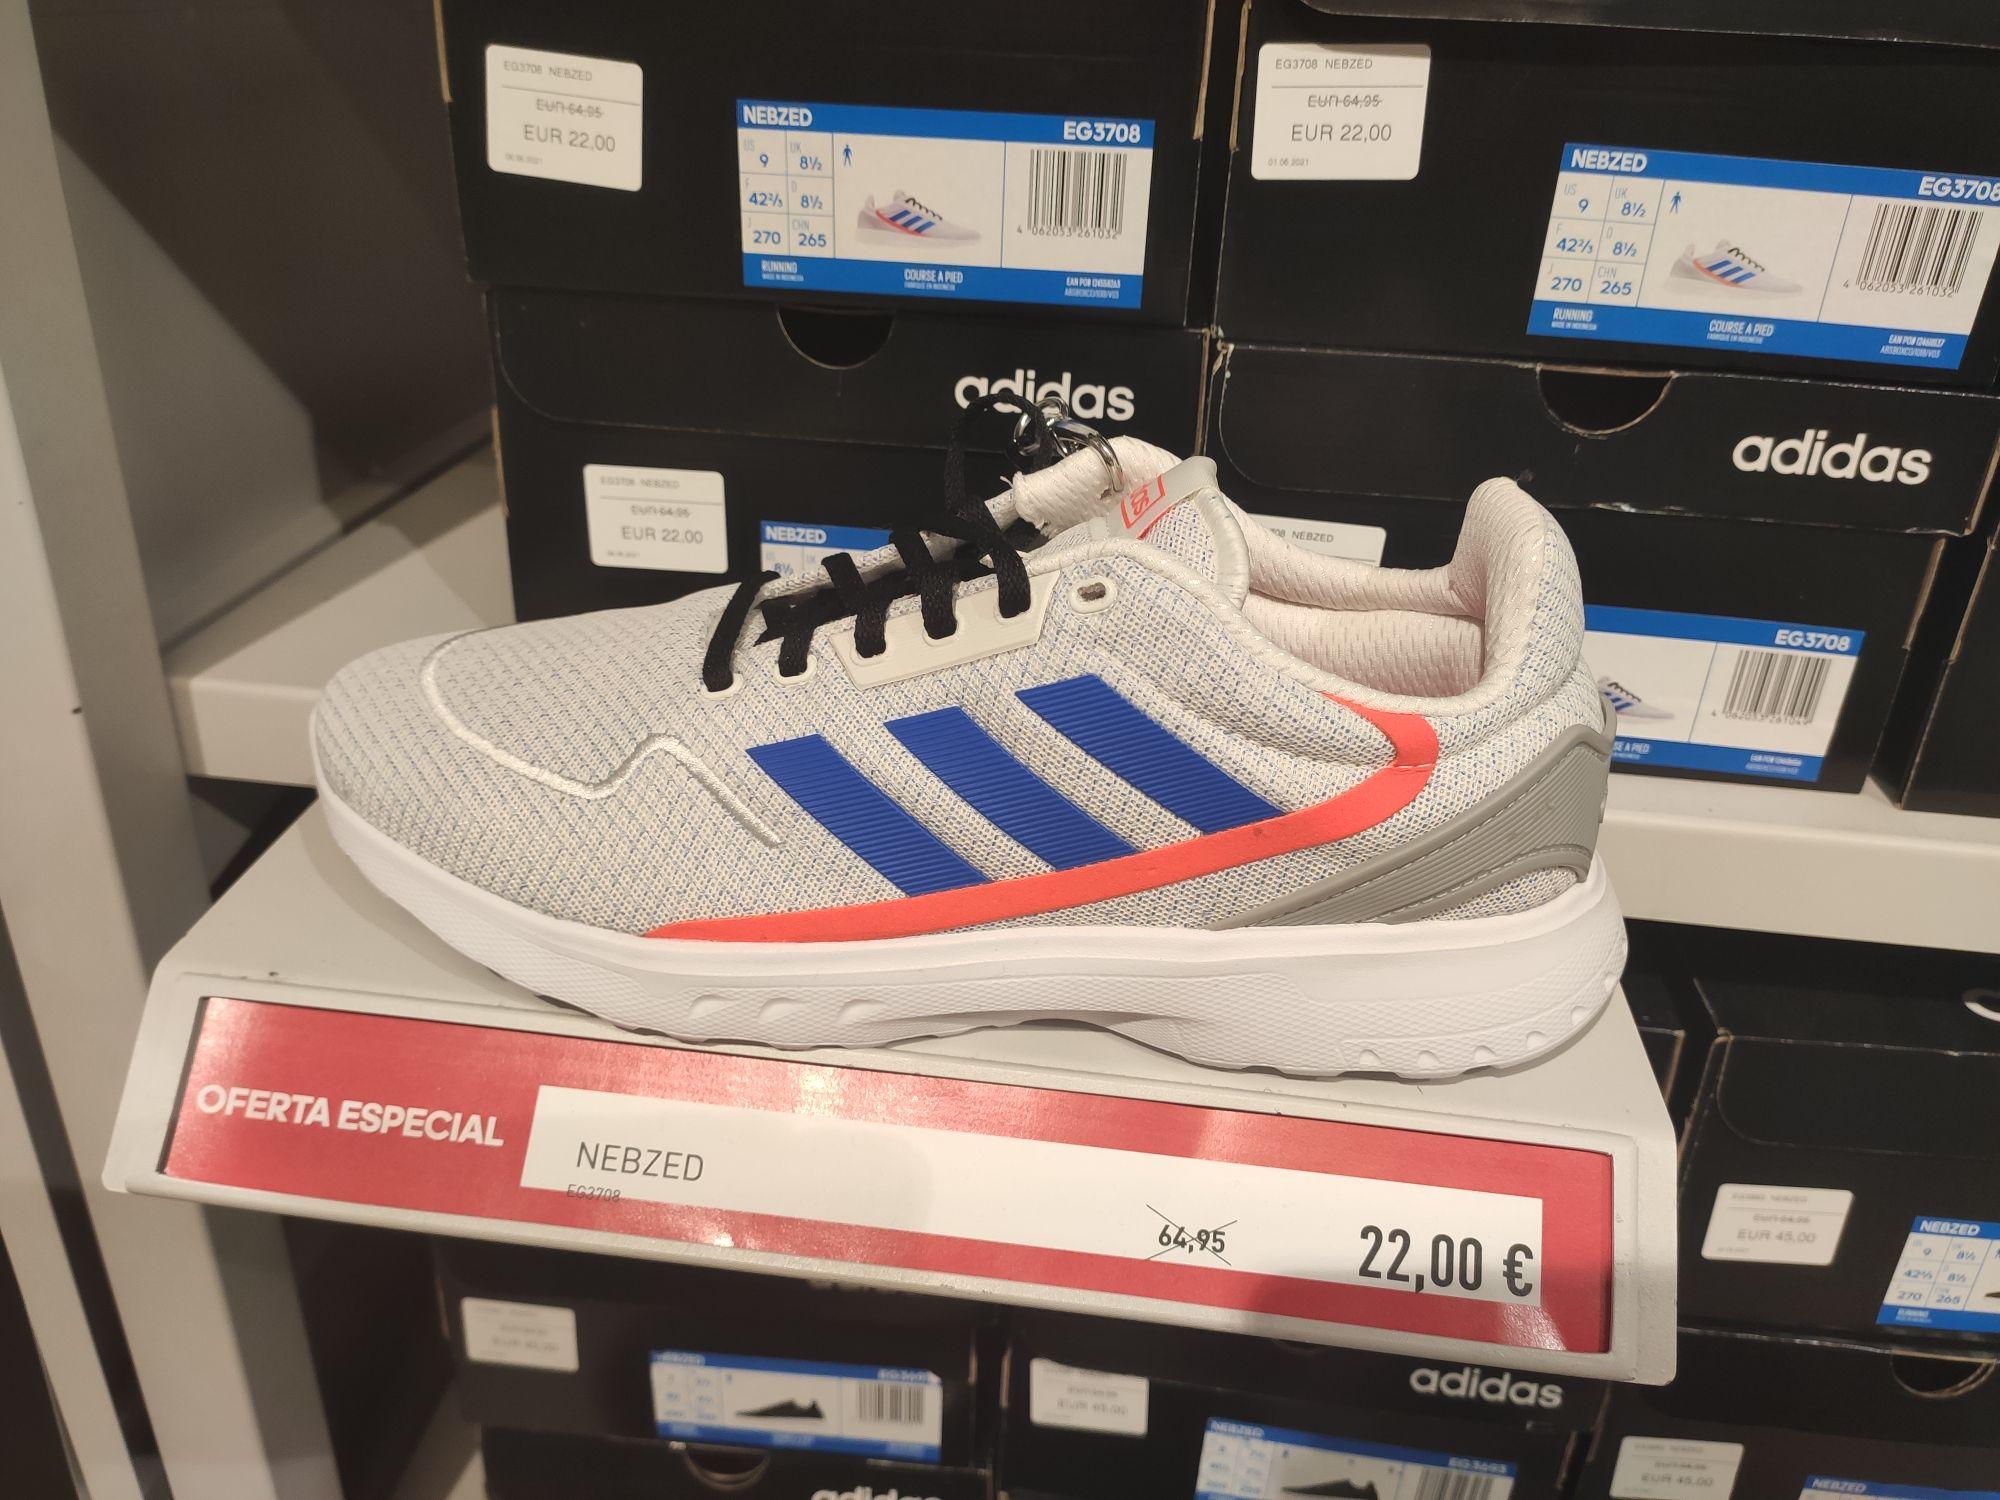 Zapatillas Adidas Nebzed